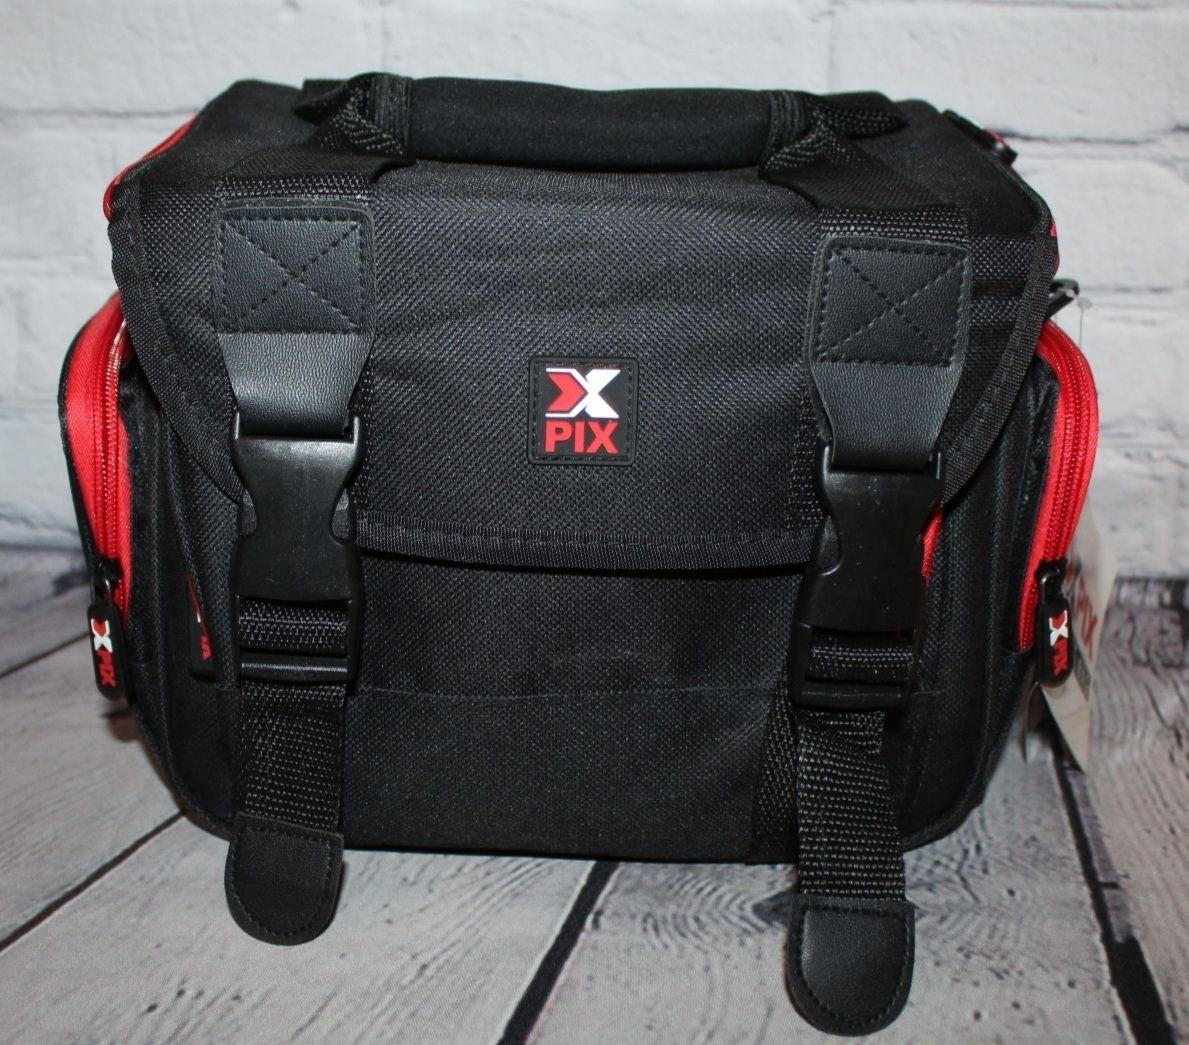 Deluxe Camera Accessories Bag